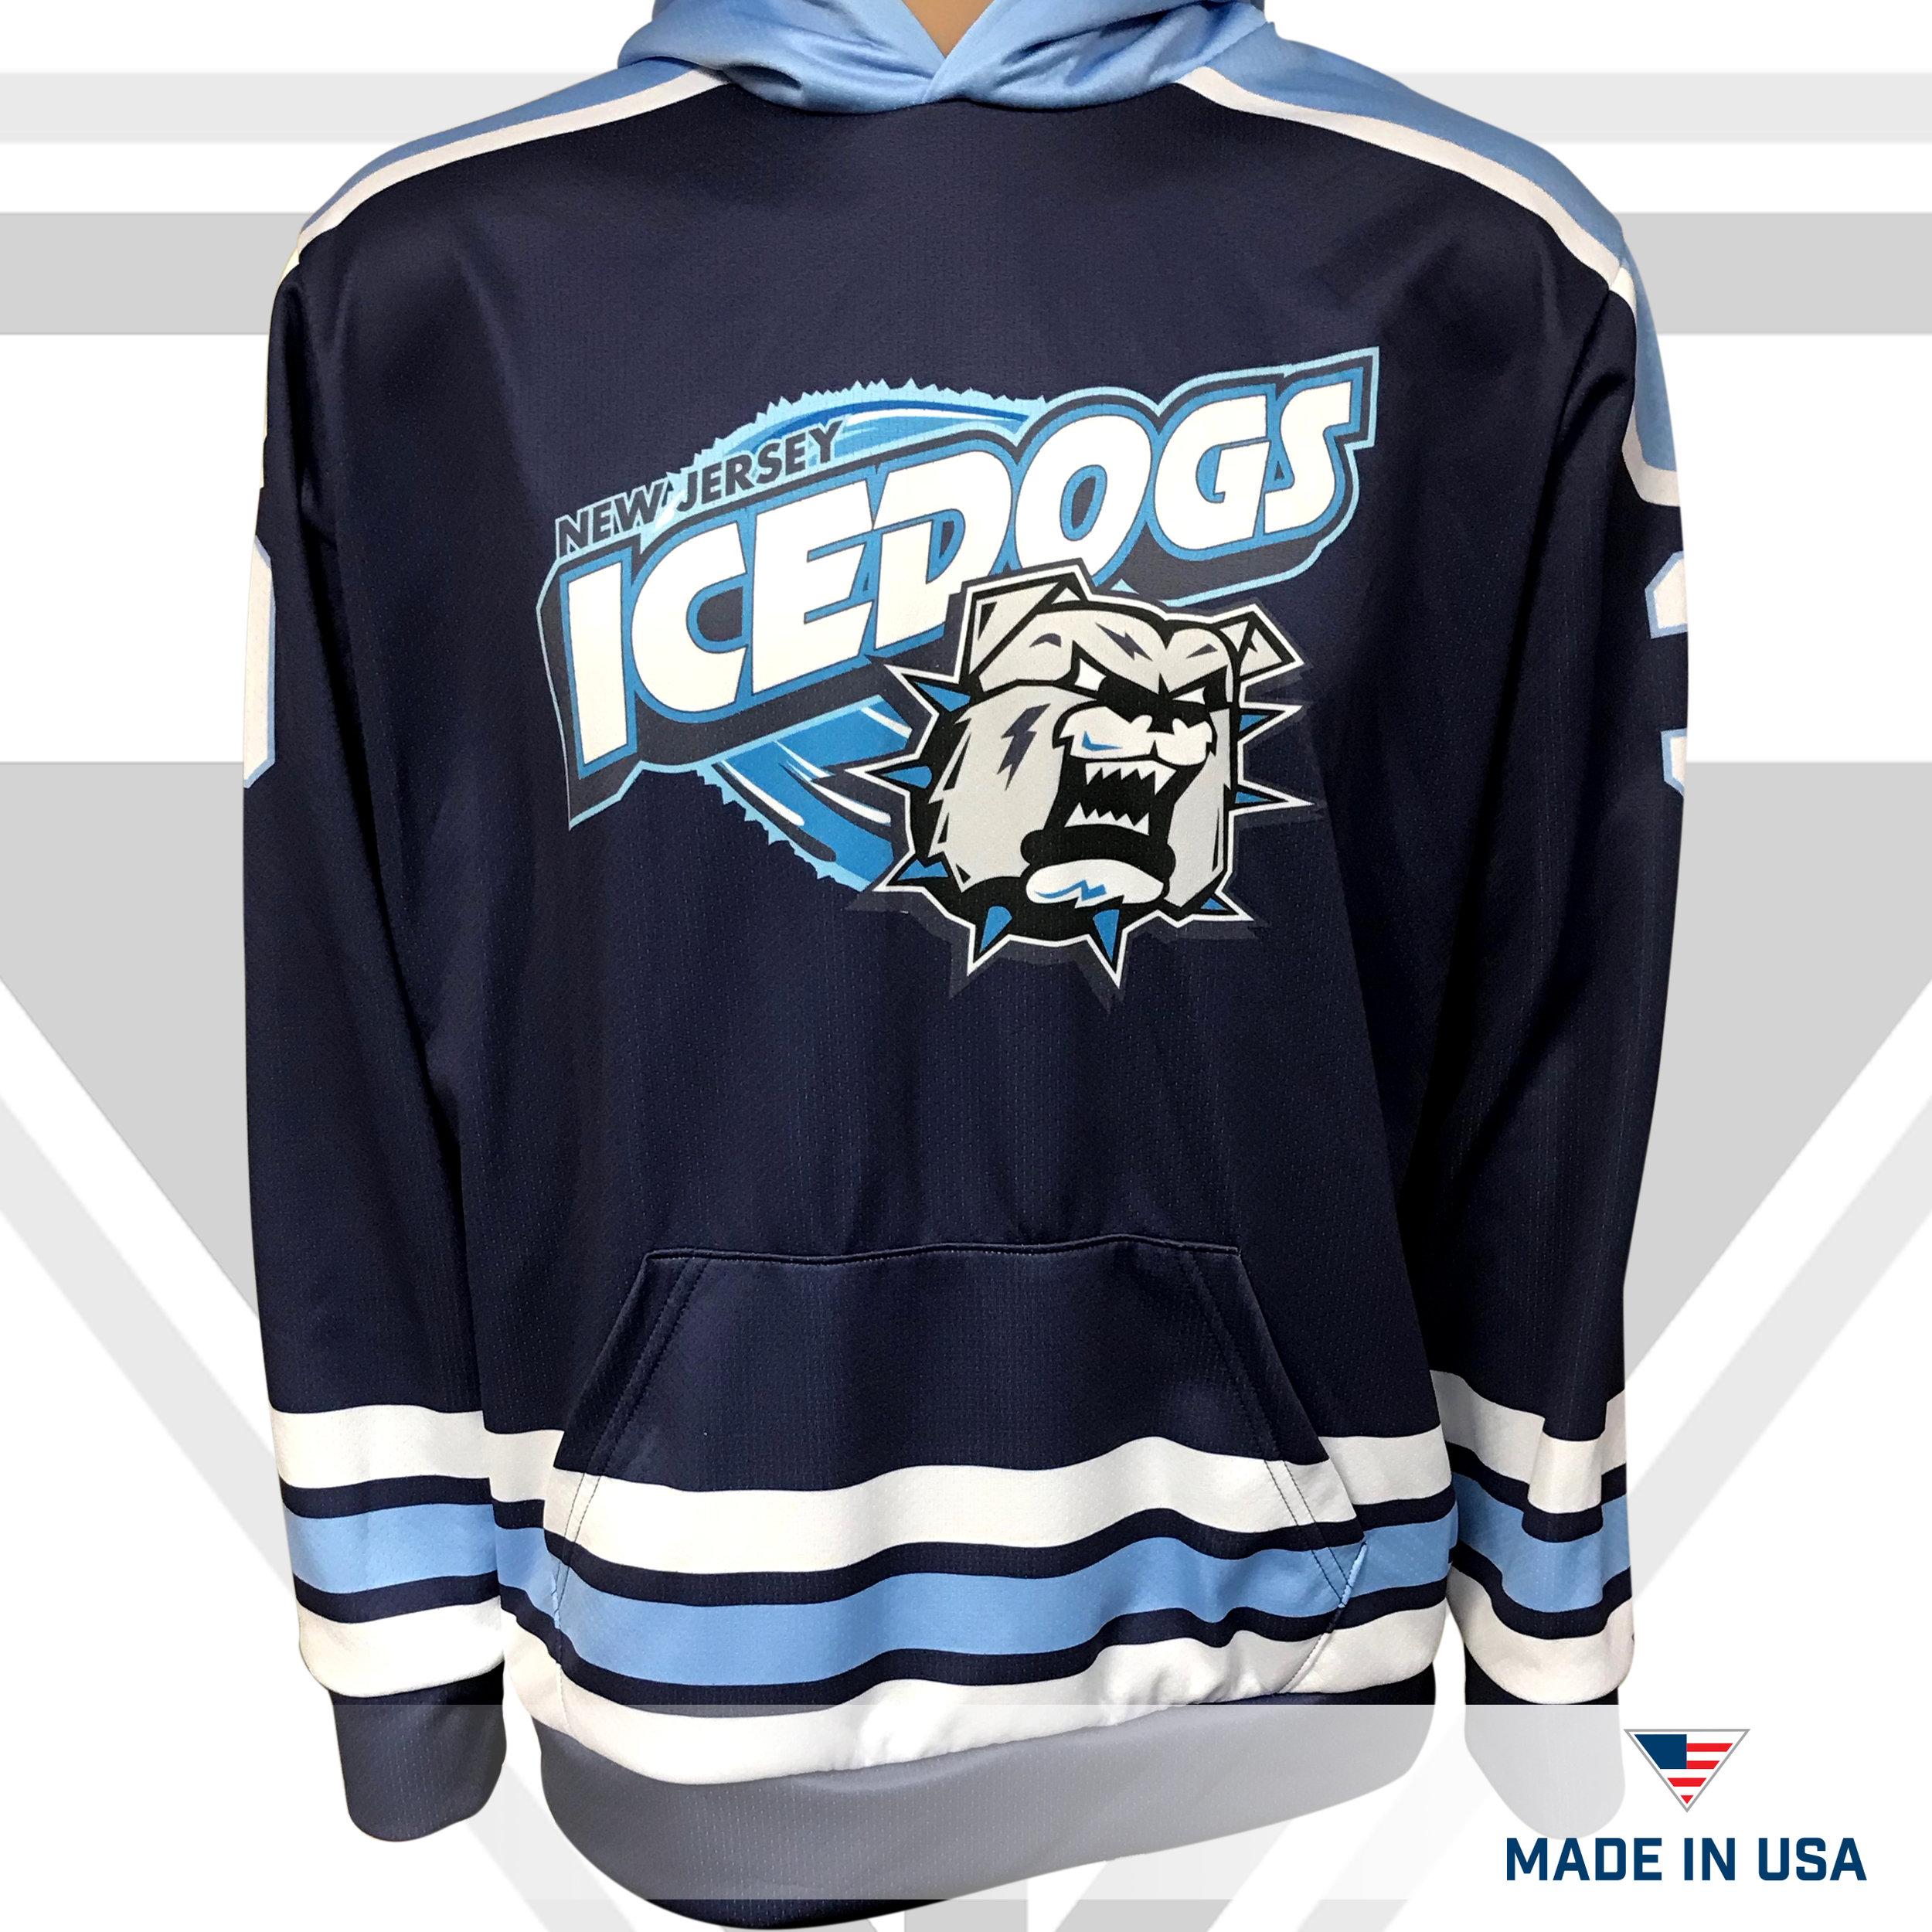 icedogs.jpg